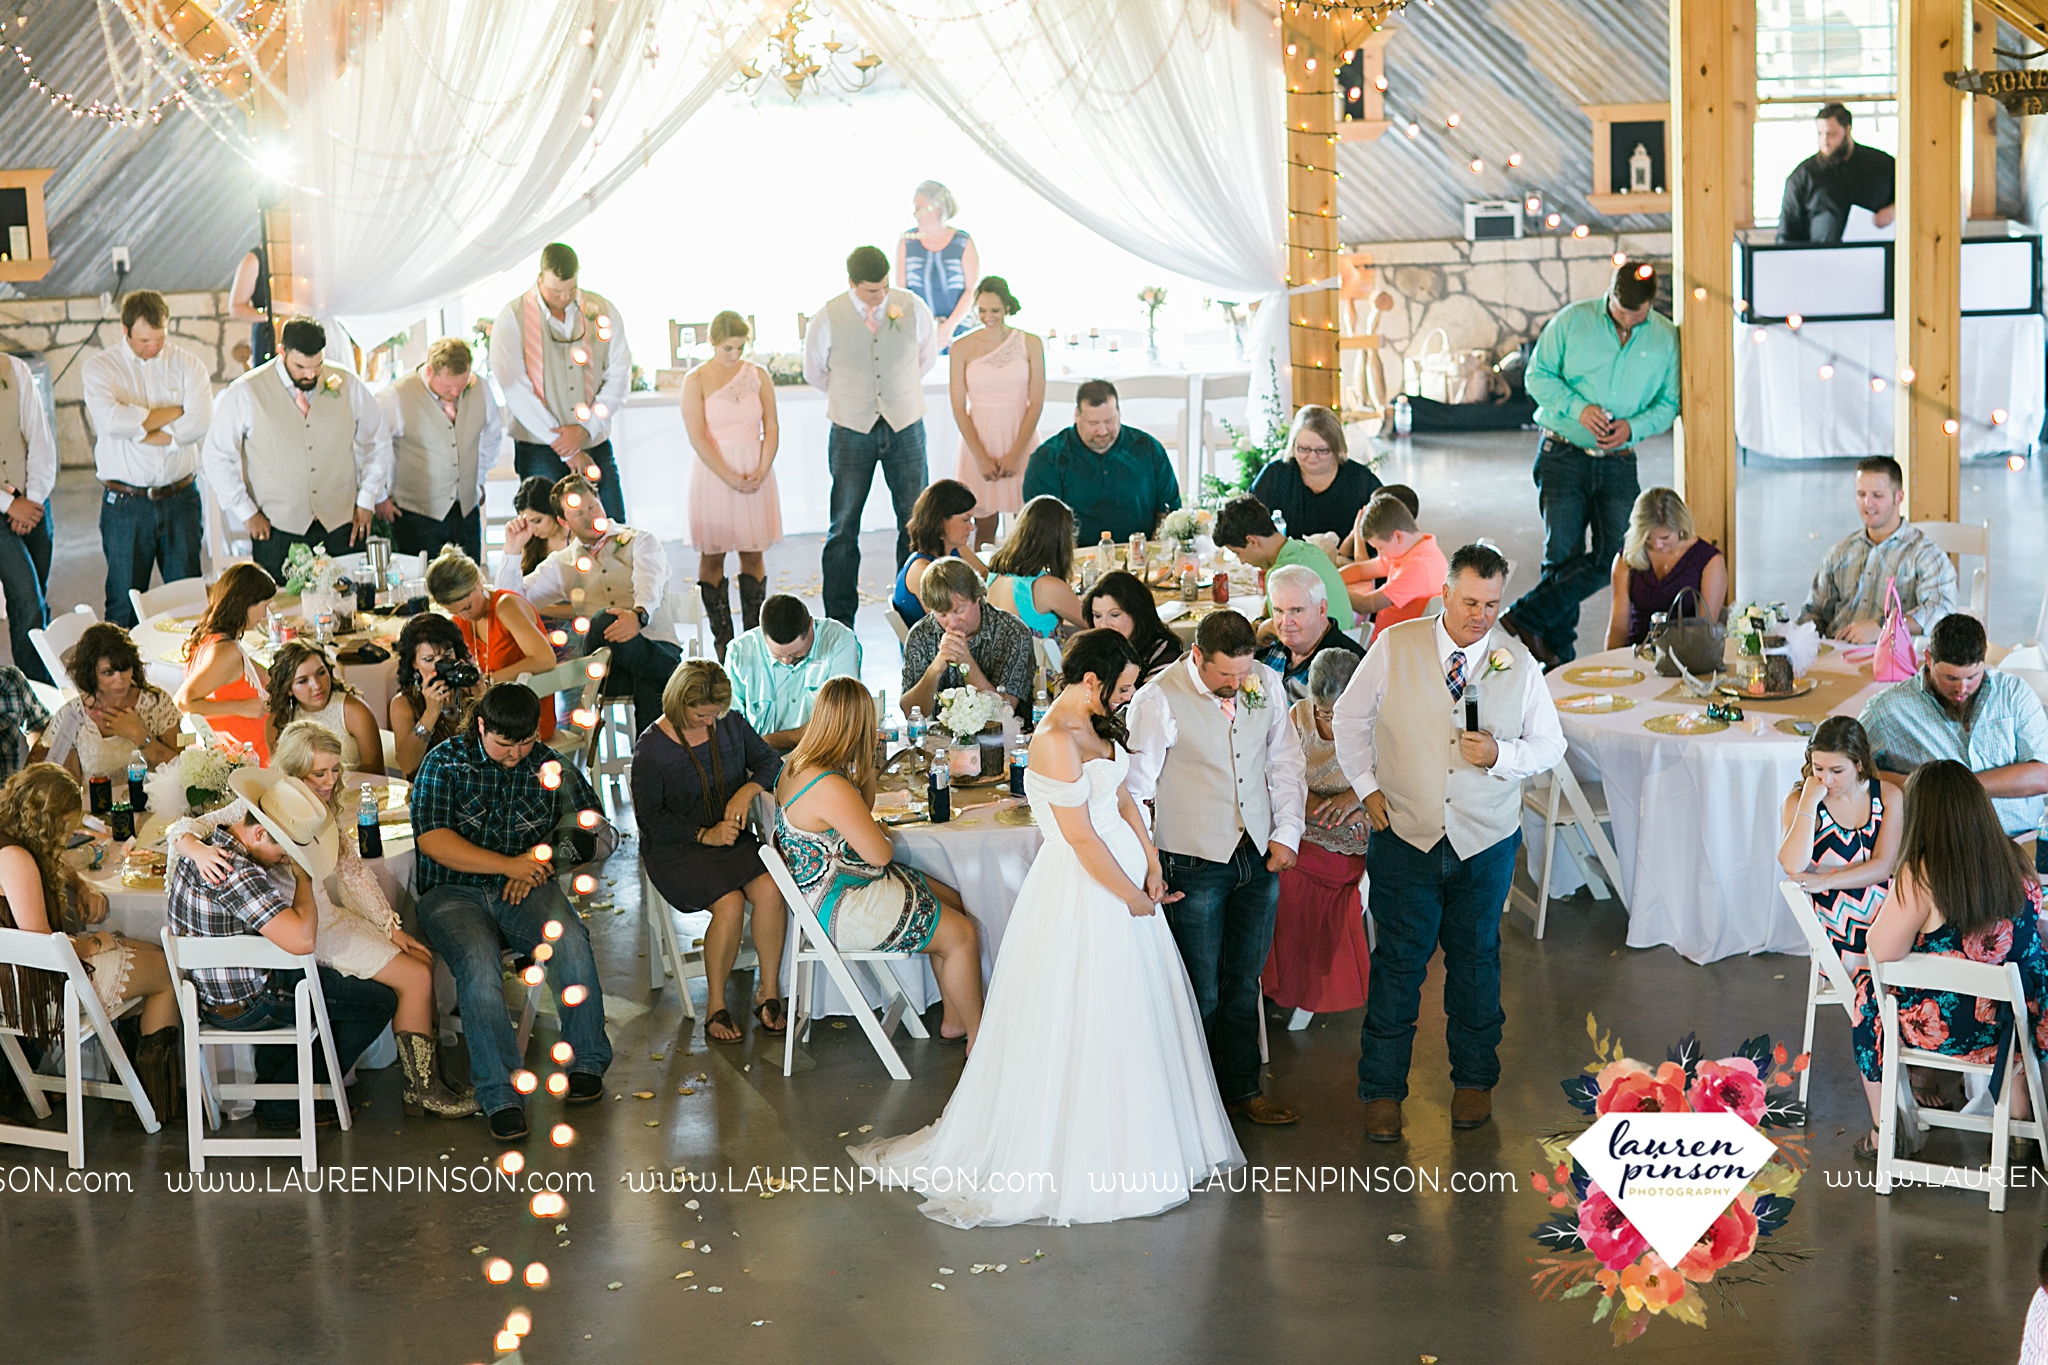 jones-barn-willow-creek-ranch-wedding-in-cleburne-texas-fort-worth-dfw-wichita-falls-wedding-photography_3257.jpg